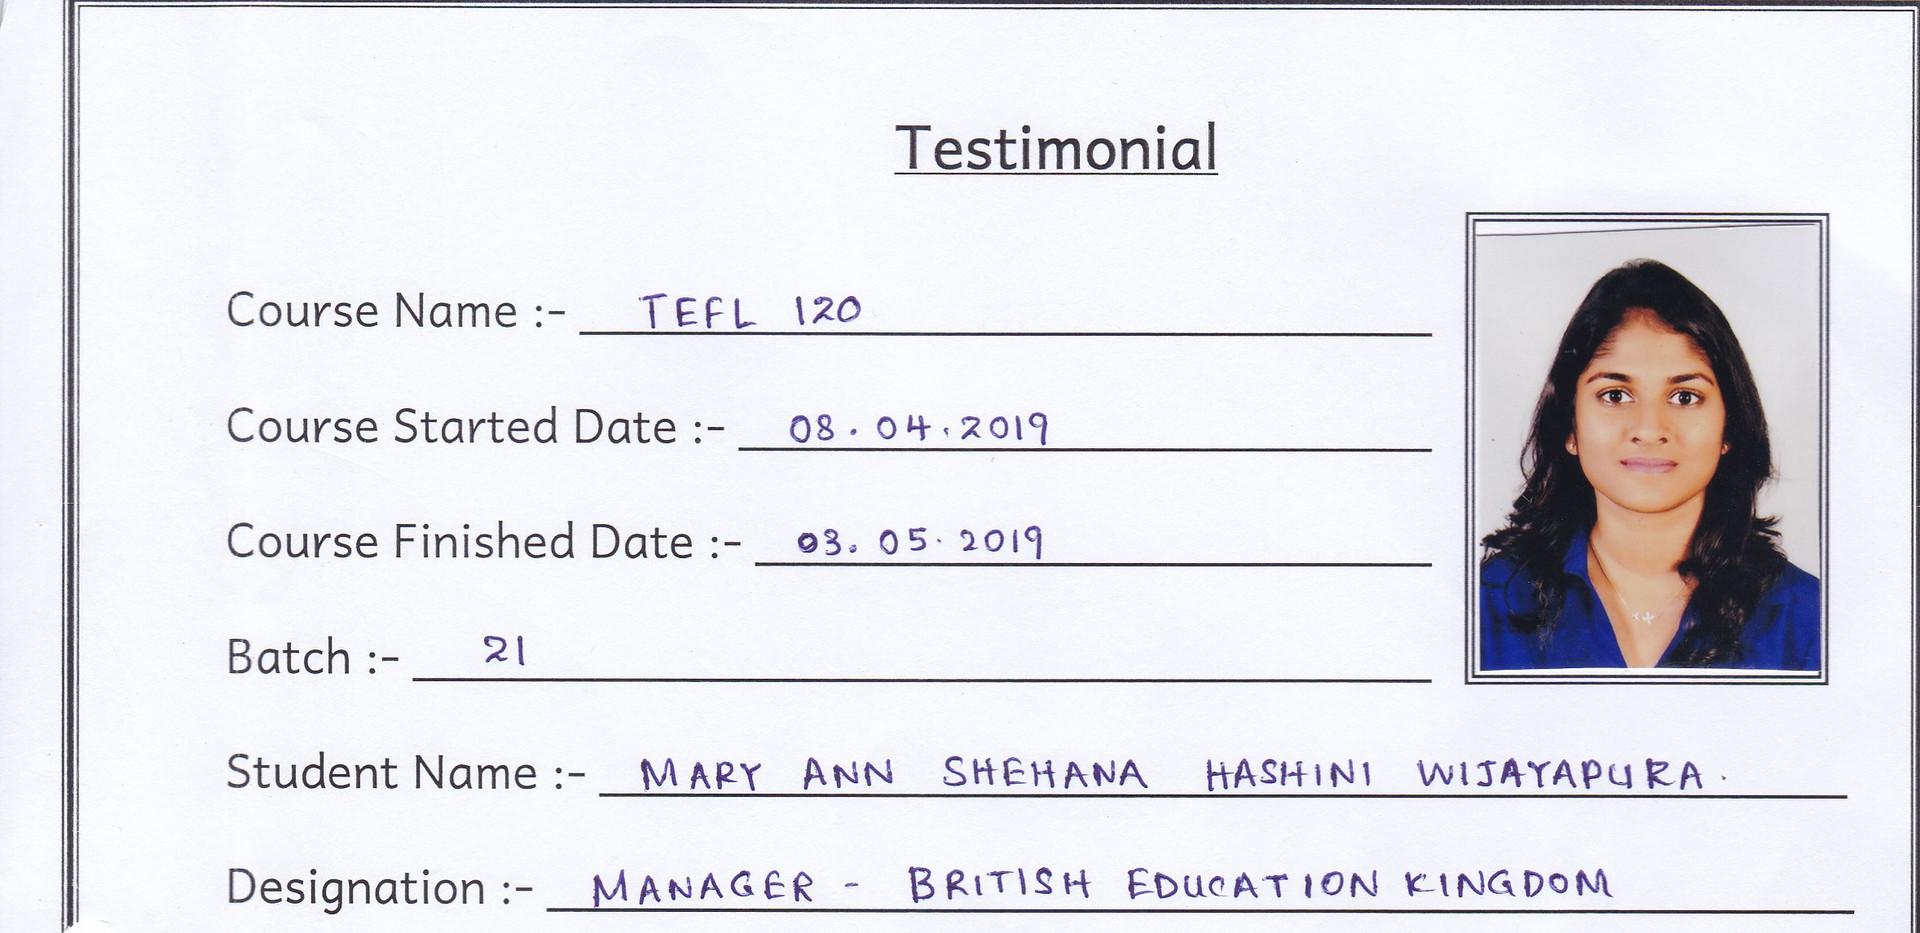 Mary Ann Shehana Hashini Wijayapura.jpg